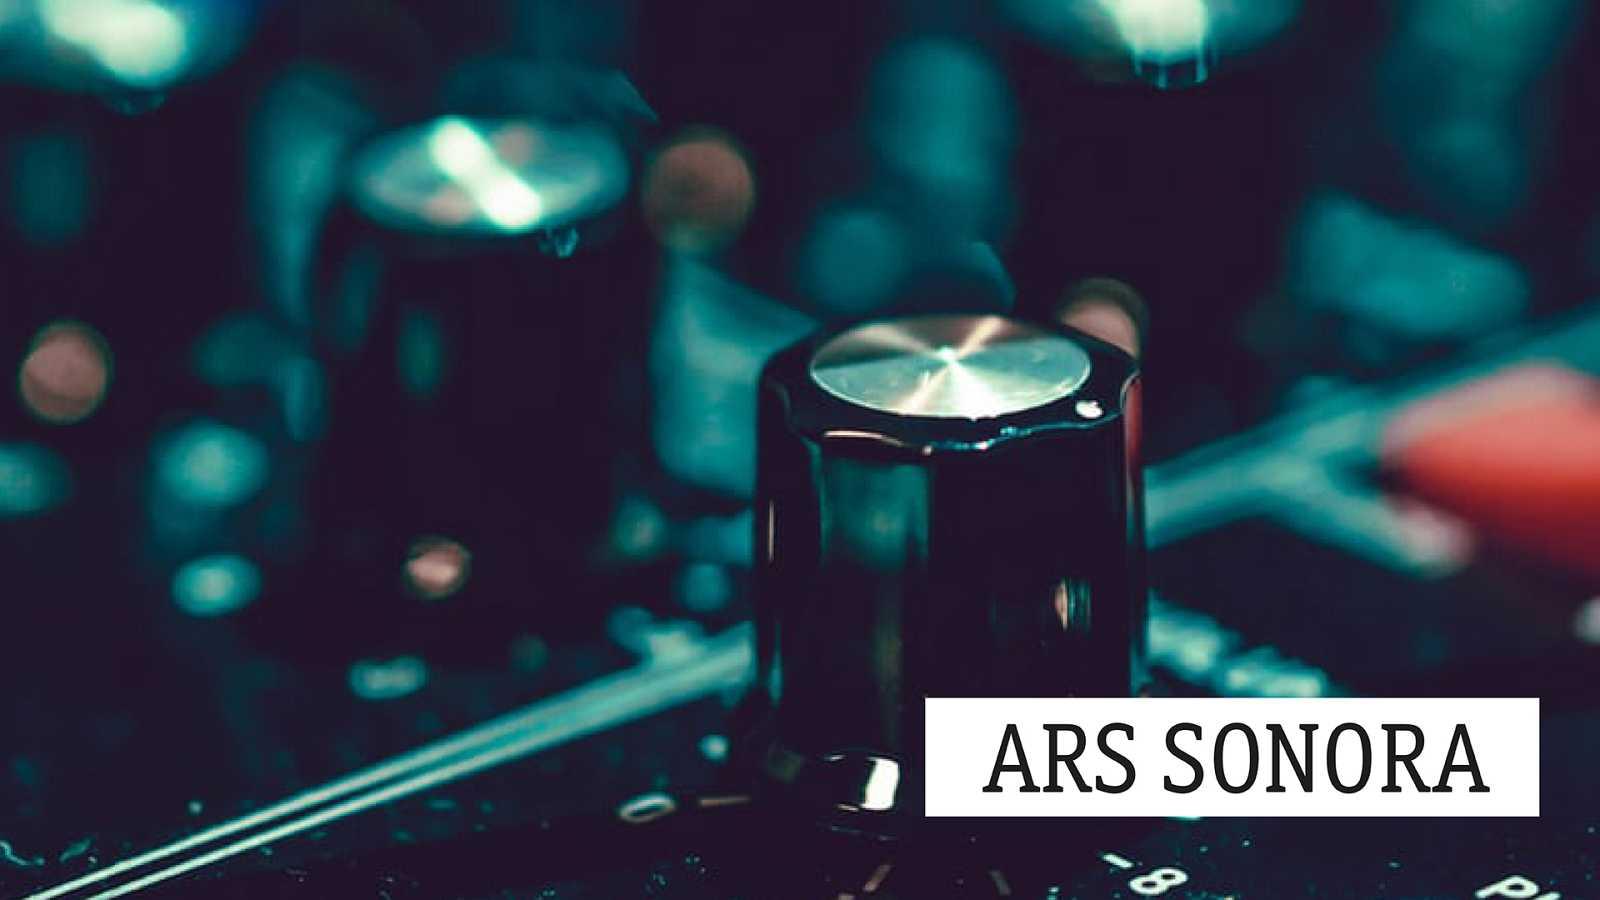 Ars sonora - Hara Alonso - 24/04/21 - escuchar ahora